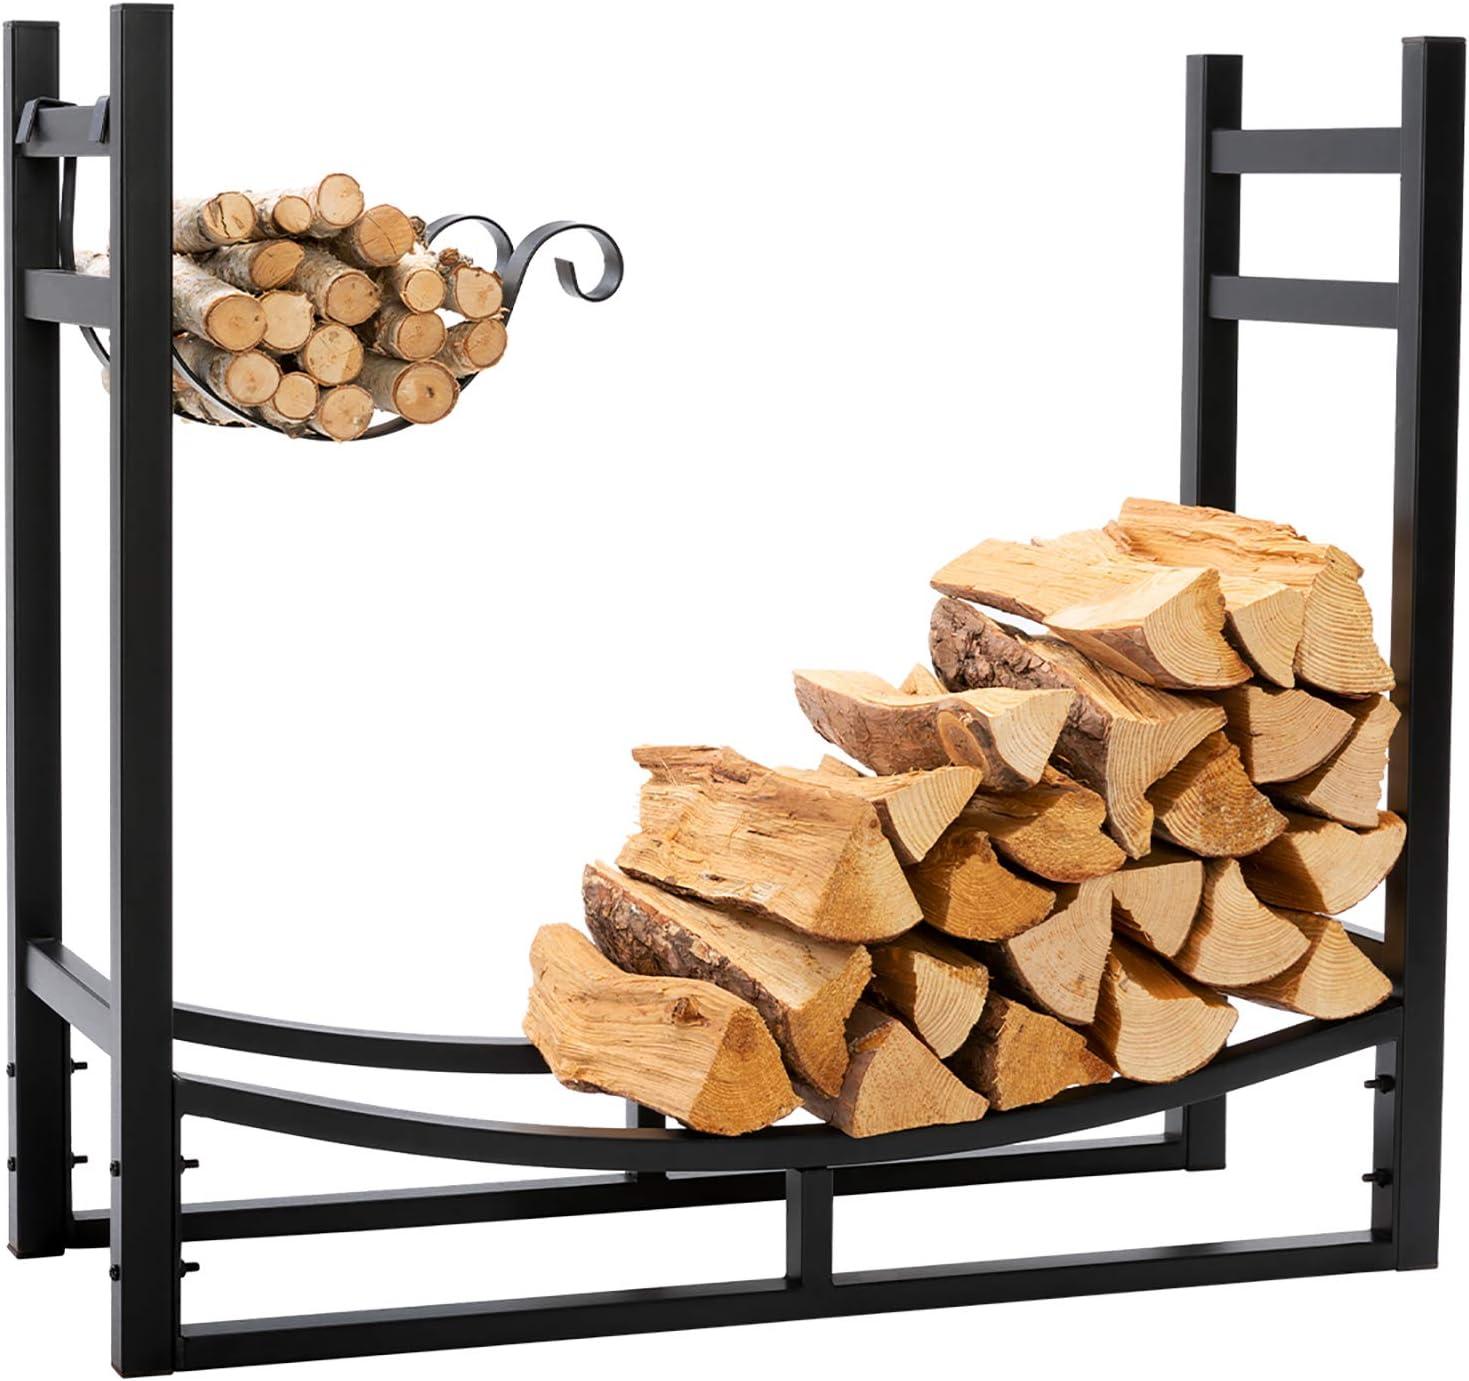 Doeworks Heavy Duty Firewood Racks 3 Feet Indoor Outdoor Log Rack With Kindling Holder 30 Inch Tall Black Home Improvement